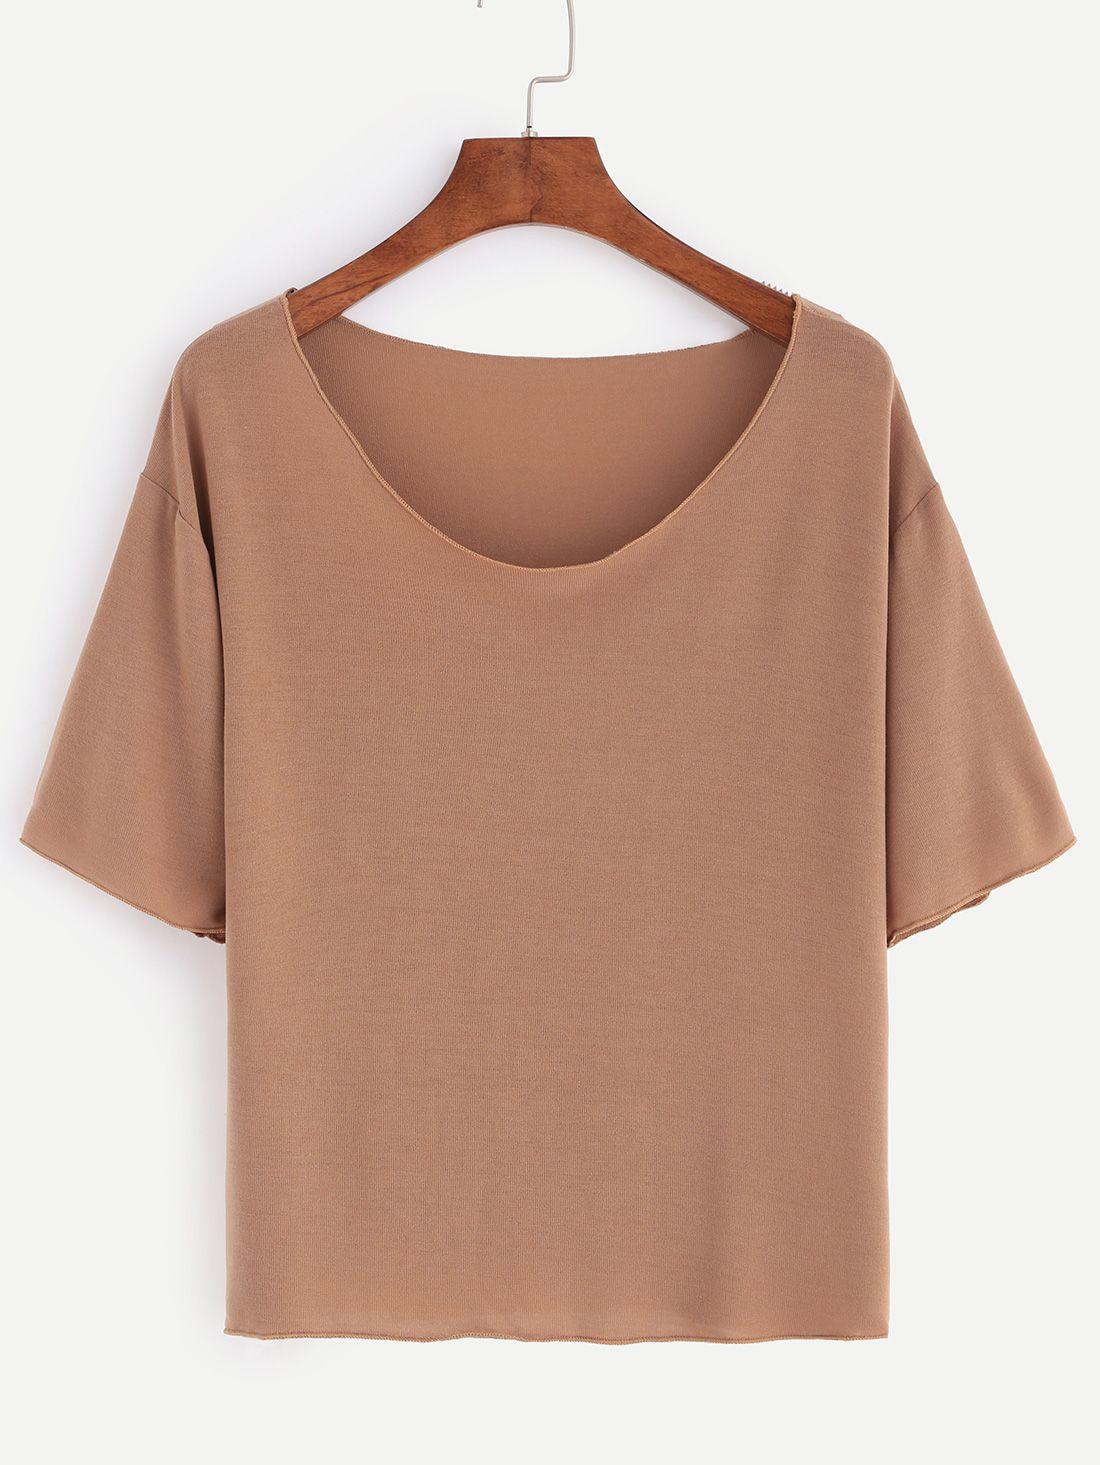 36eb6cfc21fb Light Brown Scoop Neck Plain T-shirt | My Style | Fashion, Scoop ...